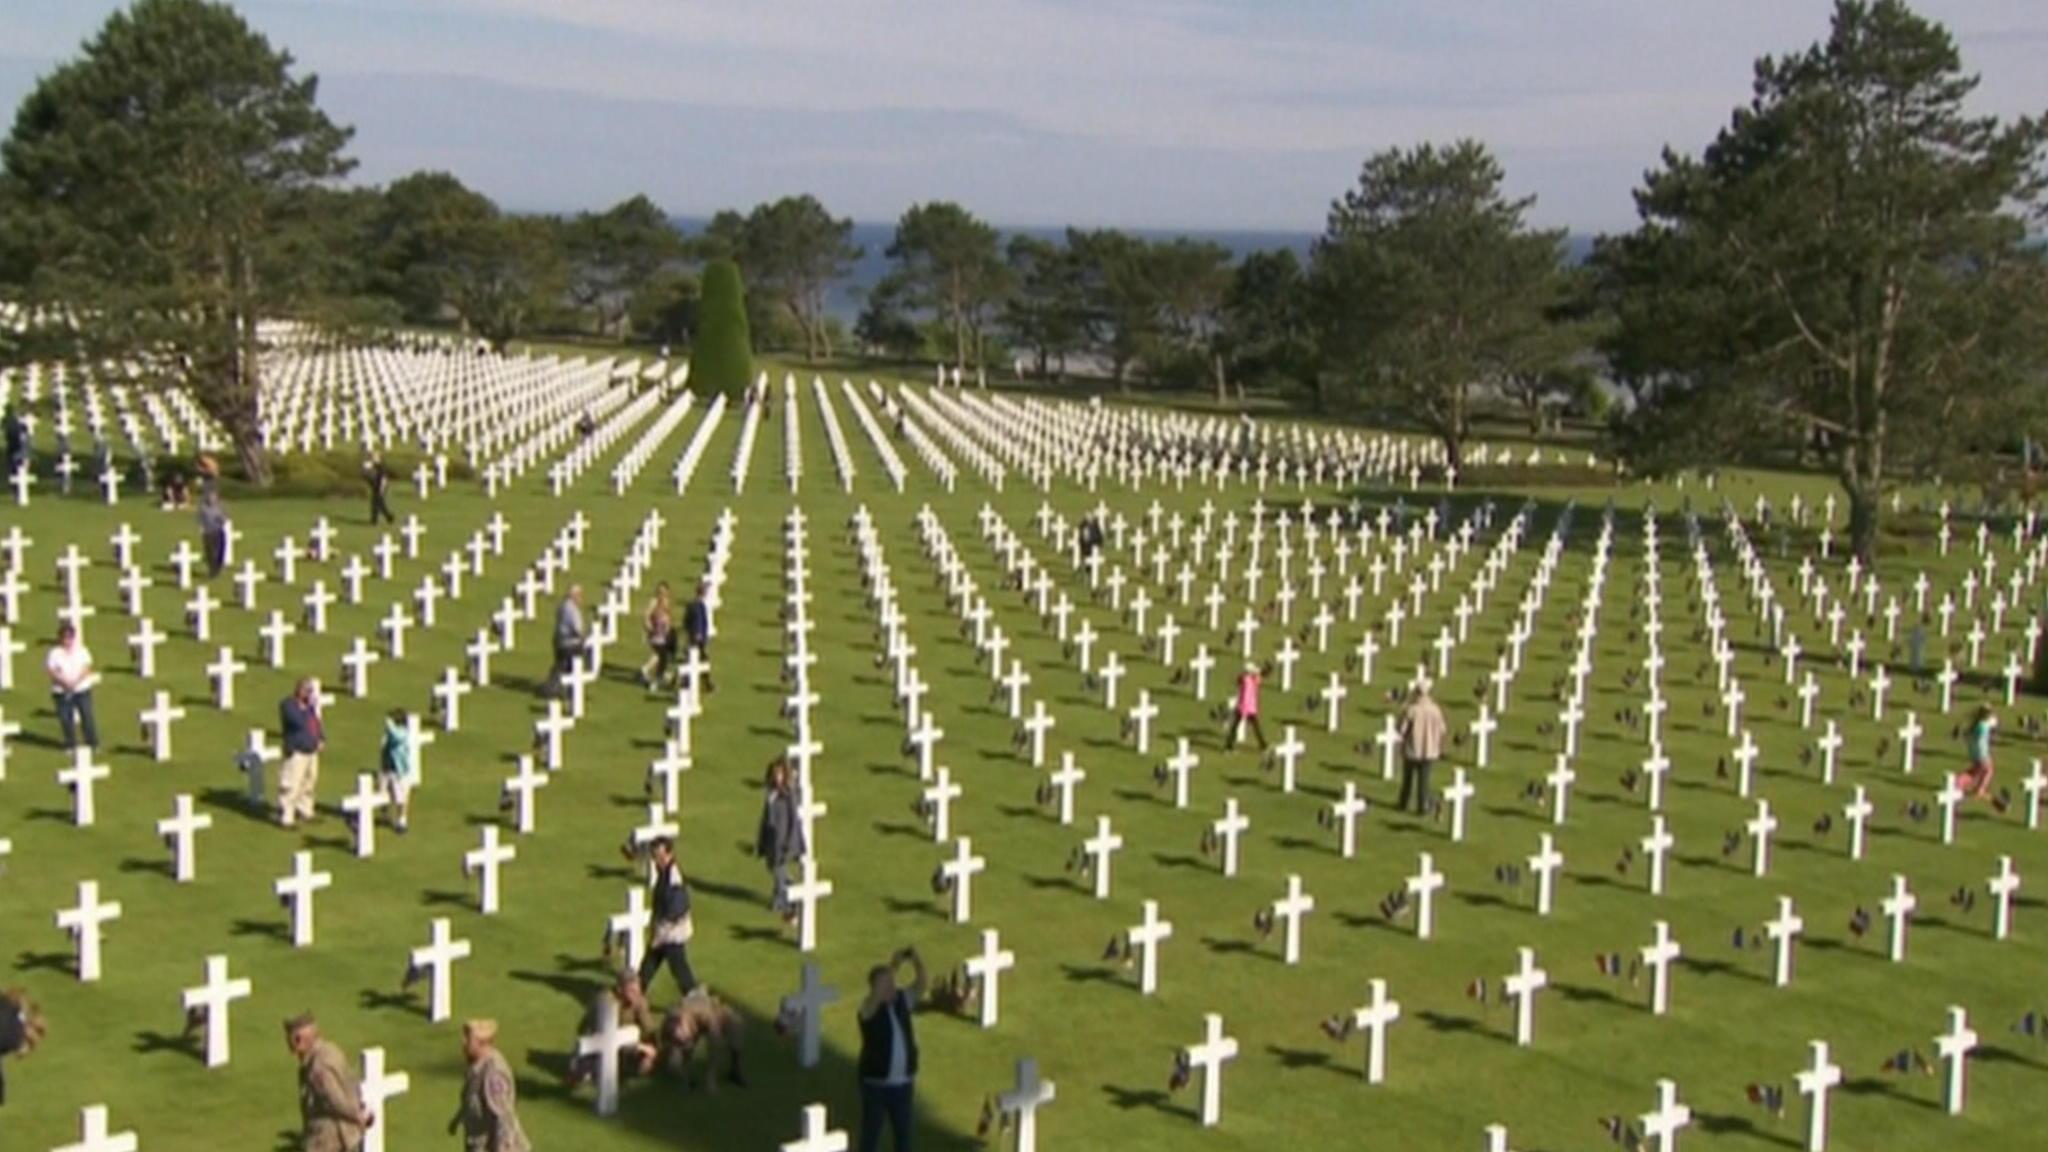 Amerikaanse slachtoffers herdacht bij Omaha Beach   NOS